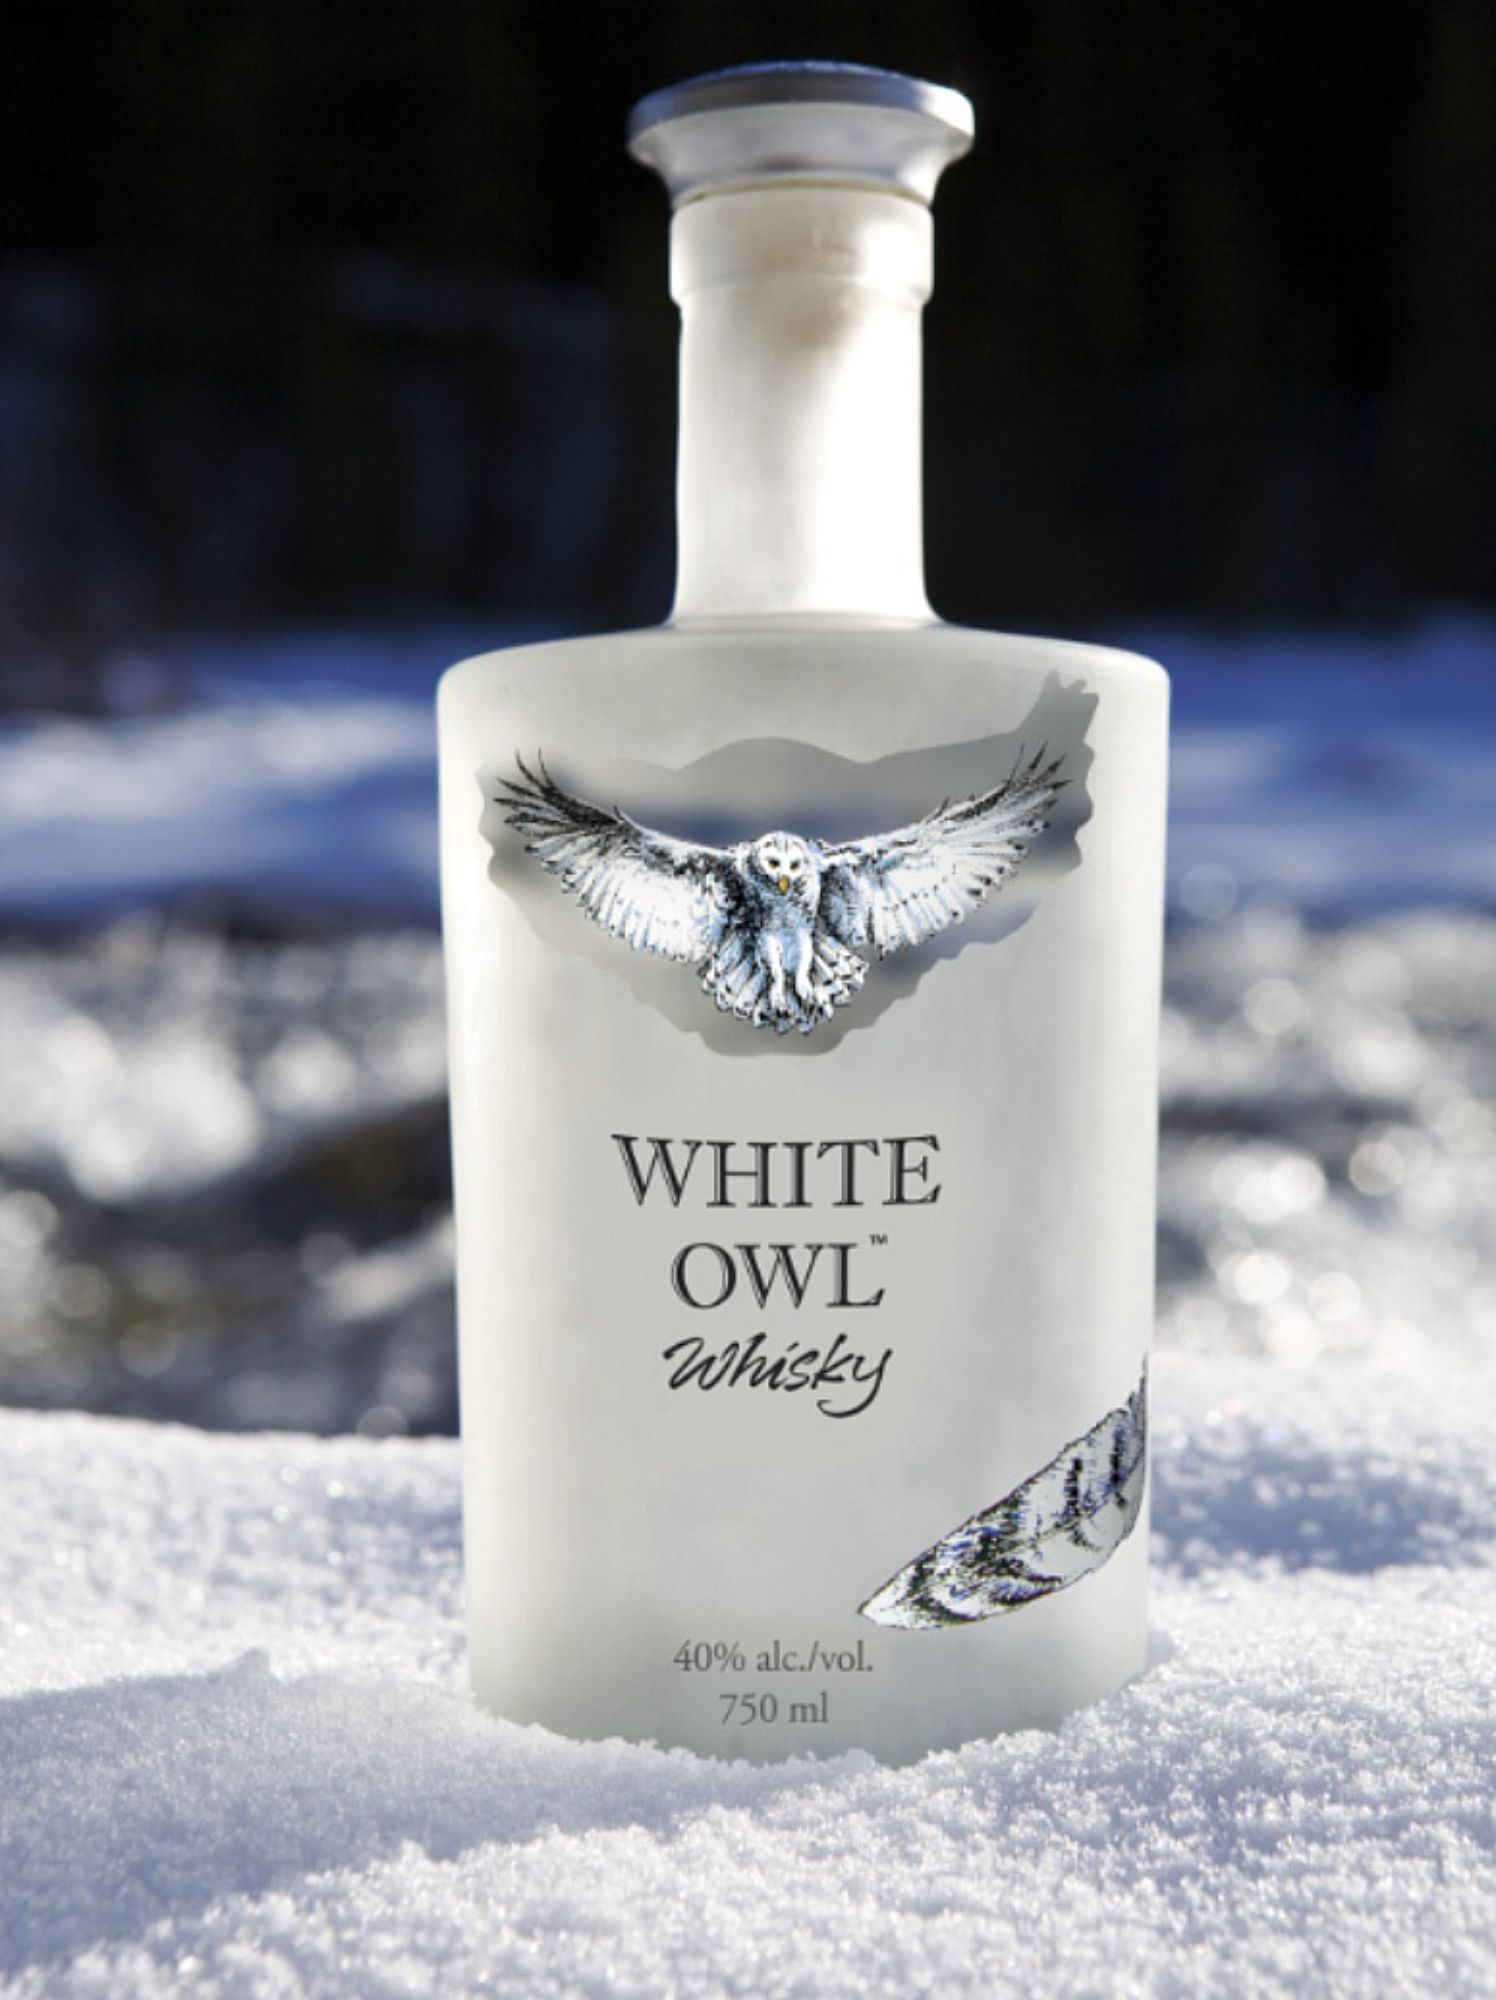 White Owl Whisky, Whisky blanc (white whisky), Highwood